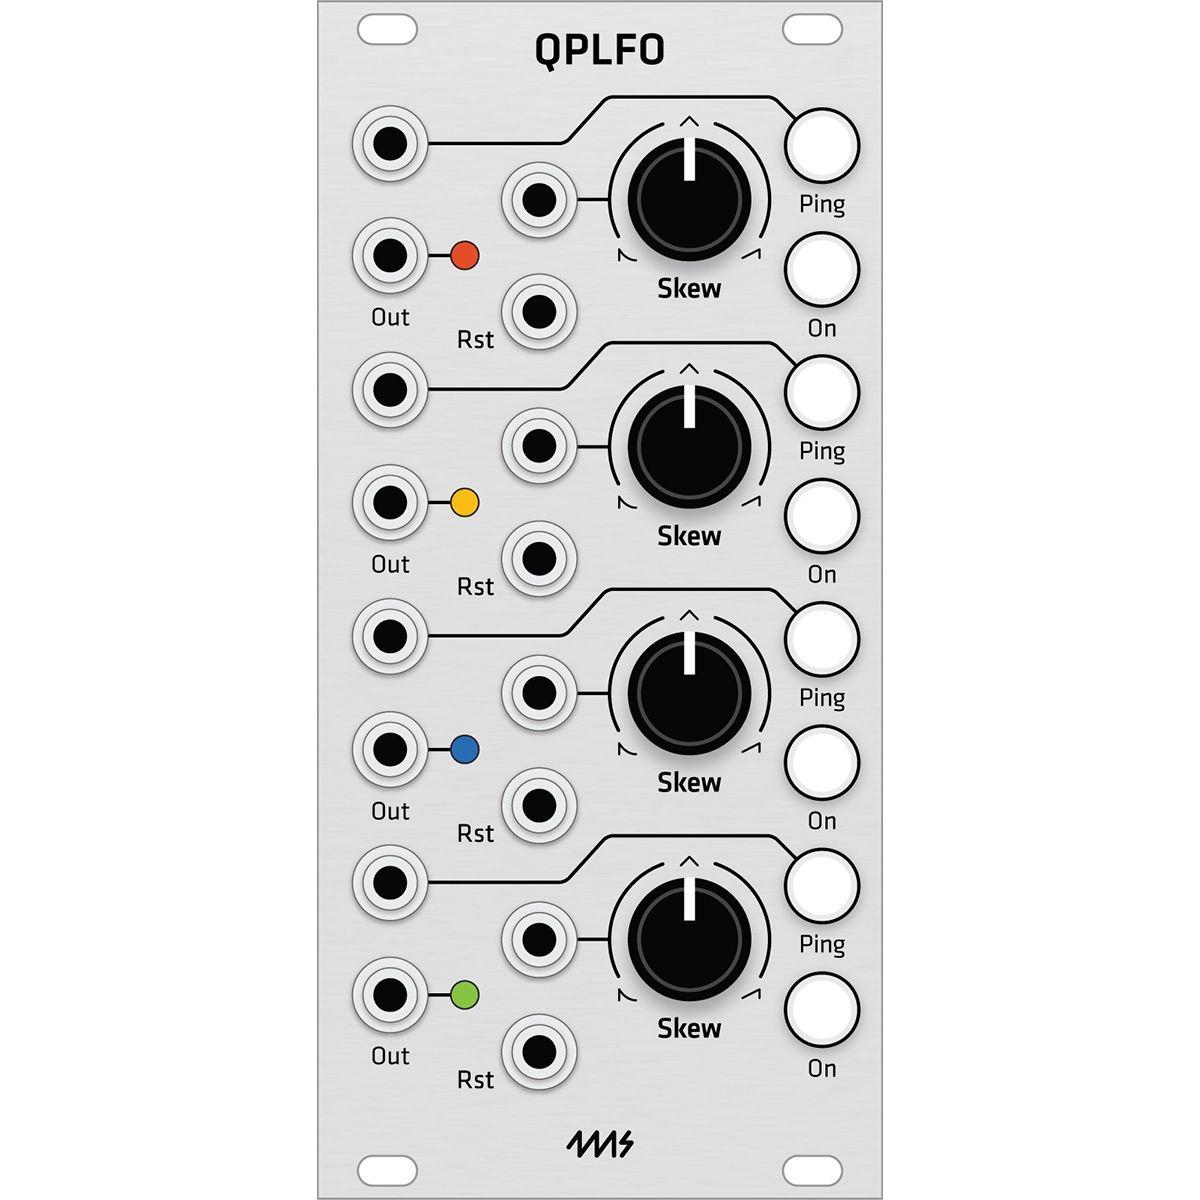 Grayscale Replacement Panel - 4ms QPLFO (Aluminium)